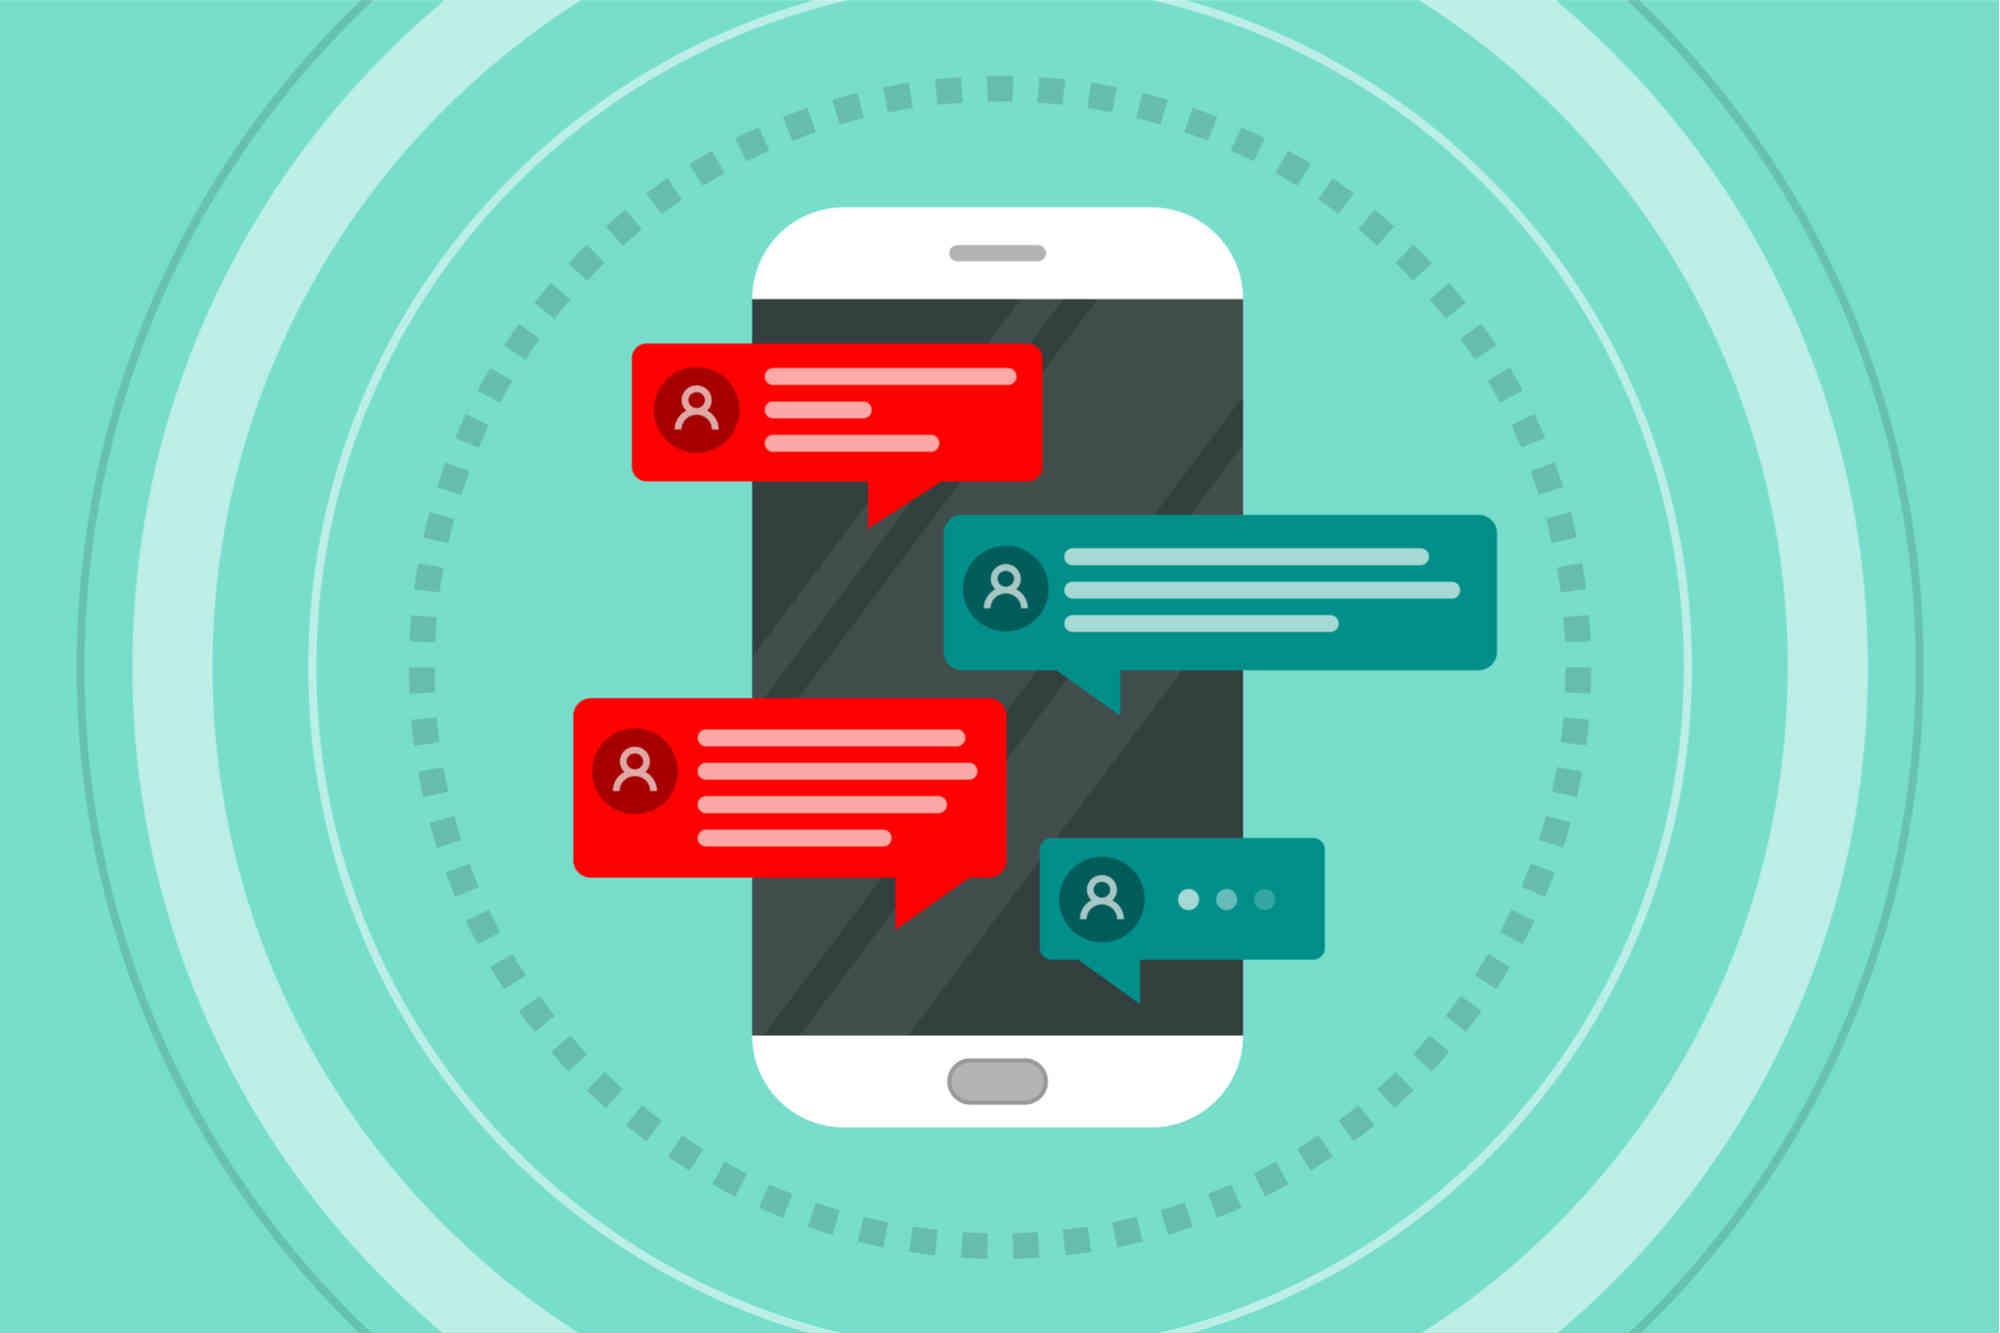 Messaging update